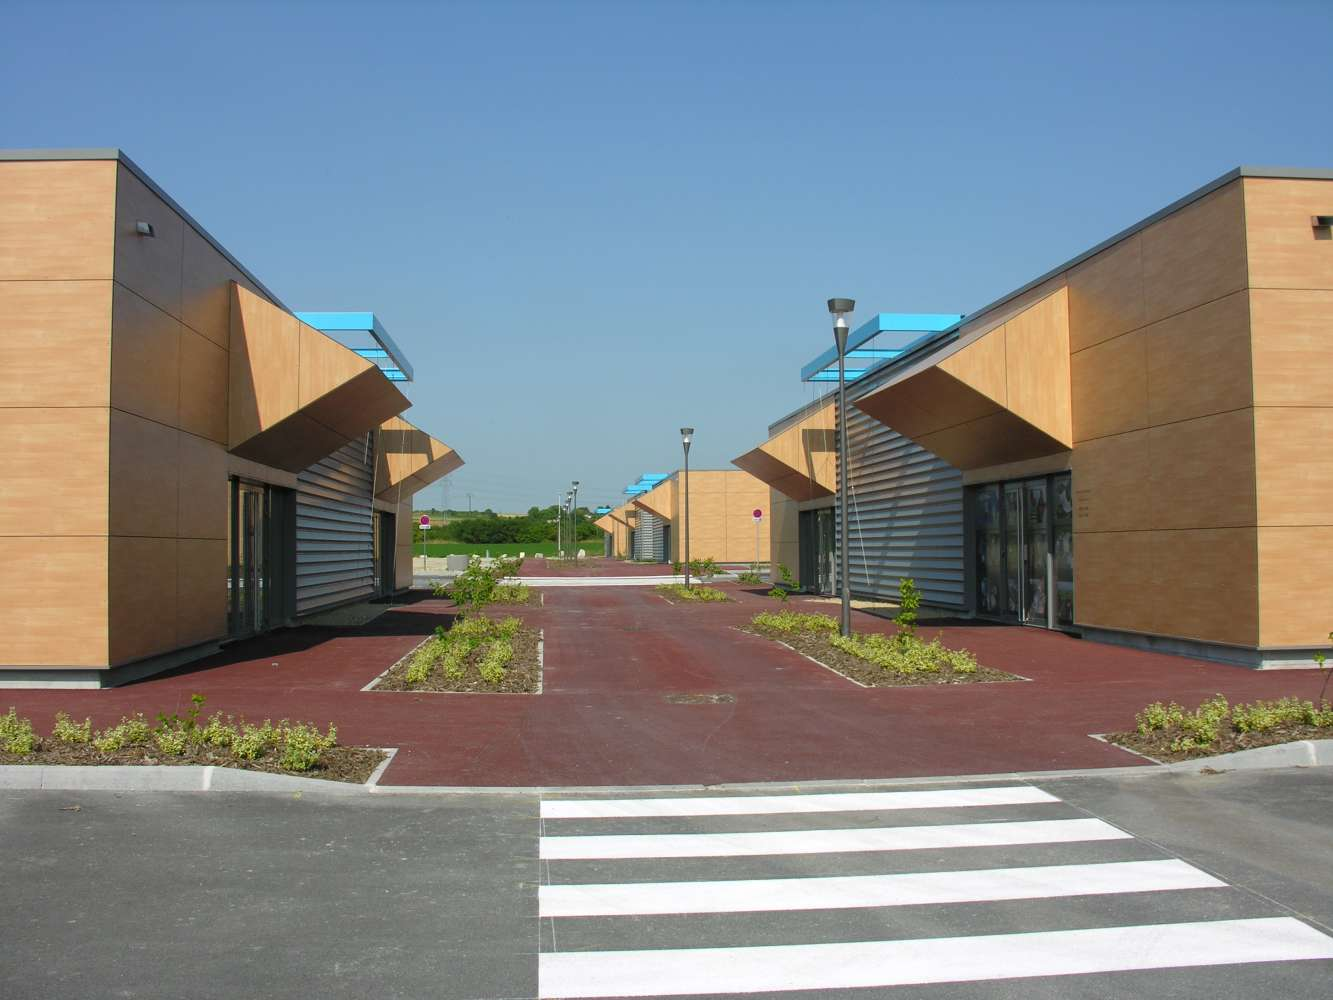 Activités/entrepôt Reims, 51100 - LES ILÔTS - 488618